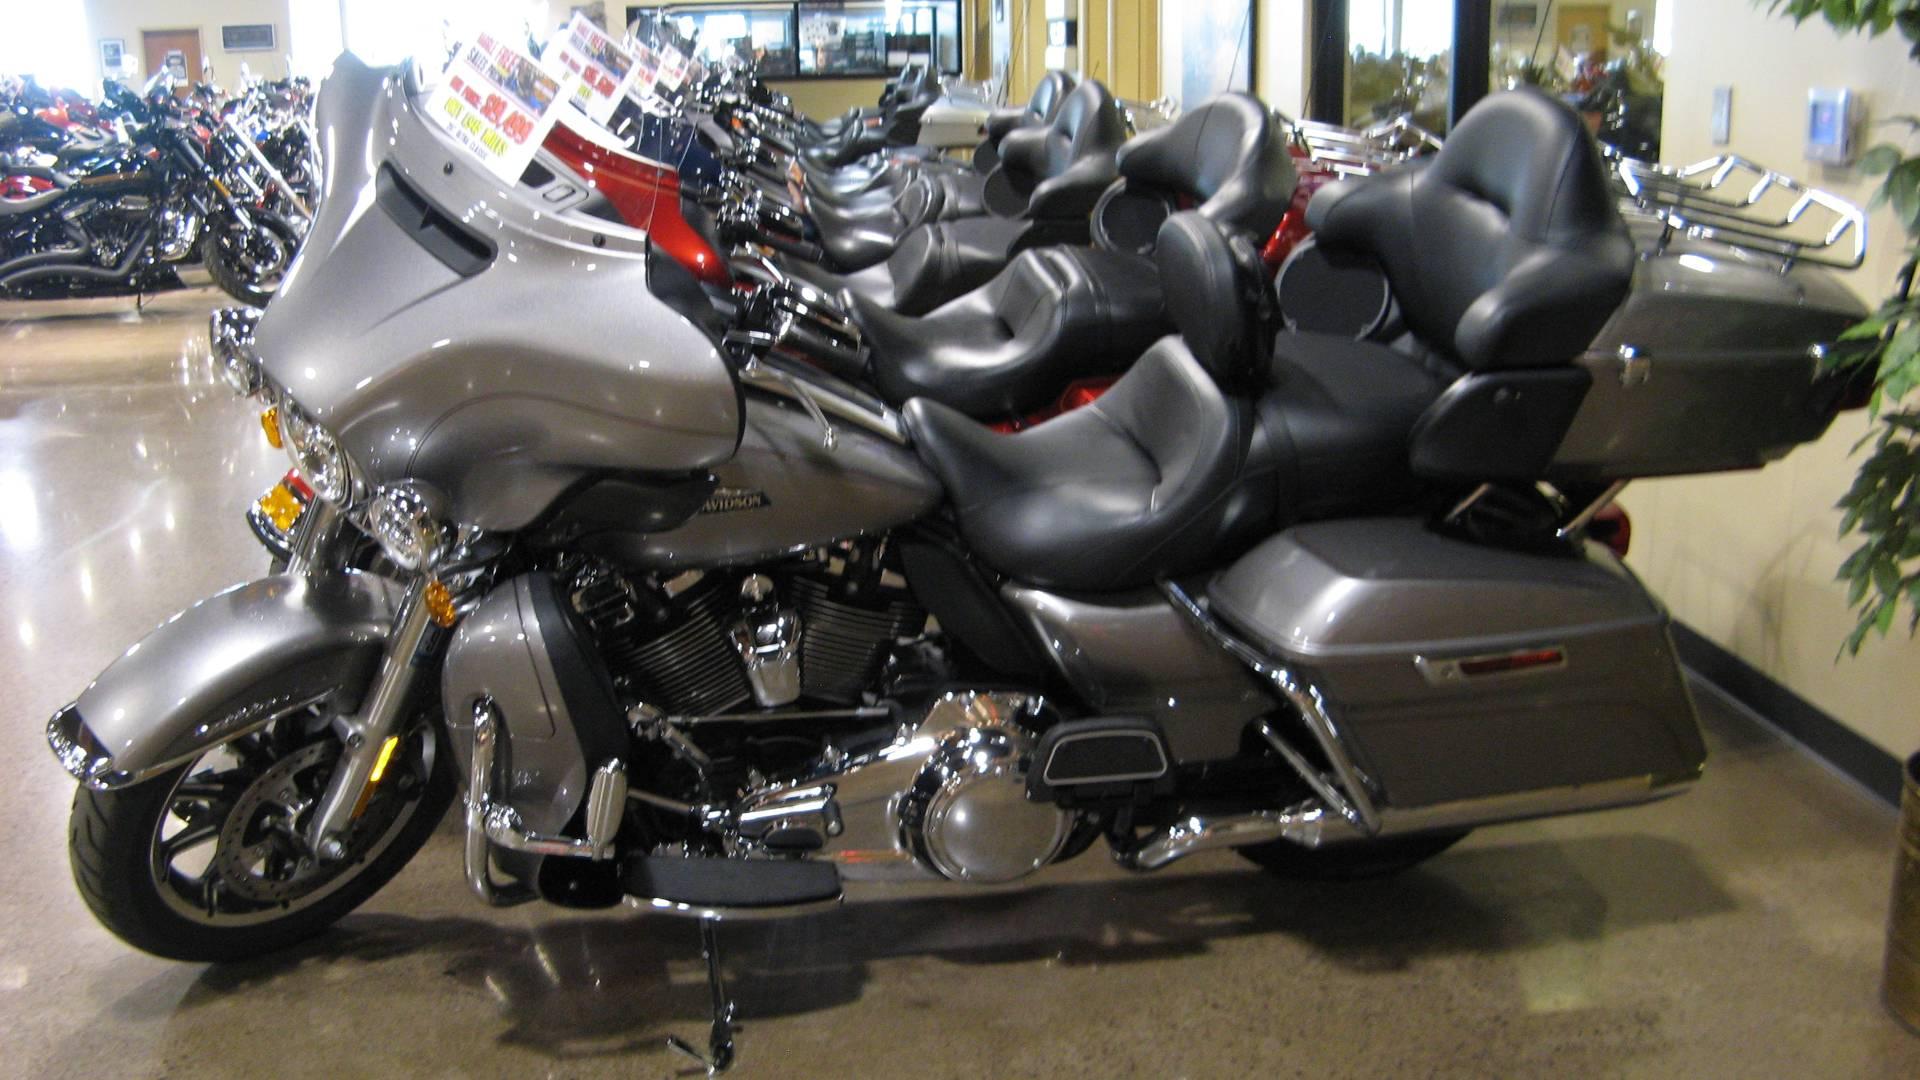 2017 Harley Davidson Electra Glide Ultra Clic In Erie Pennsylvania